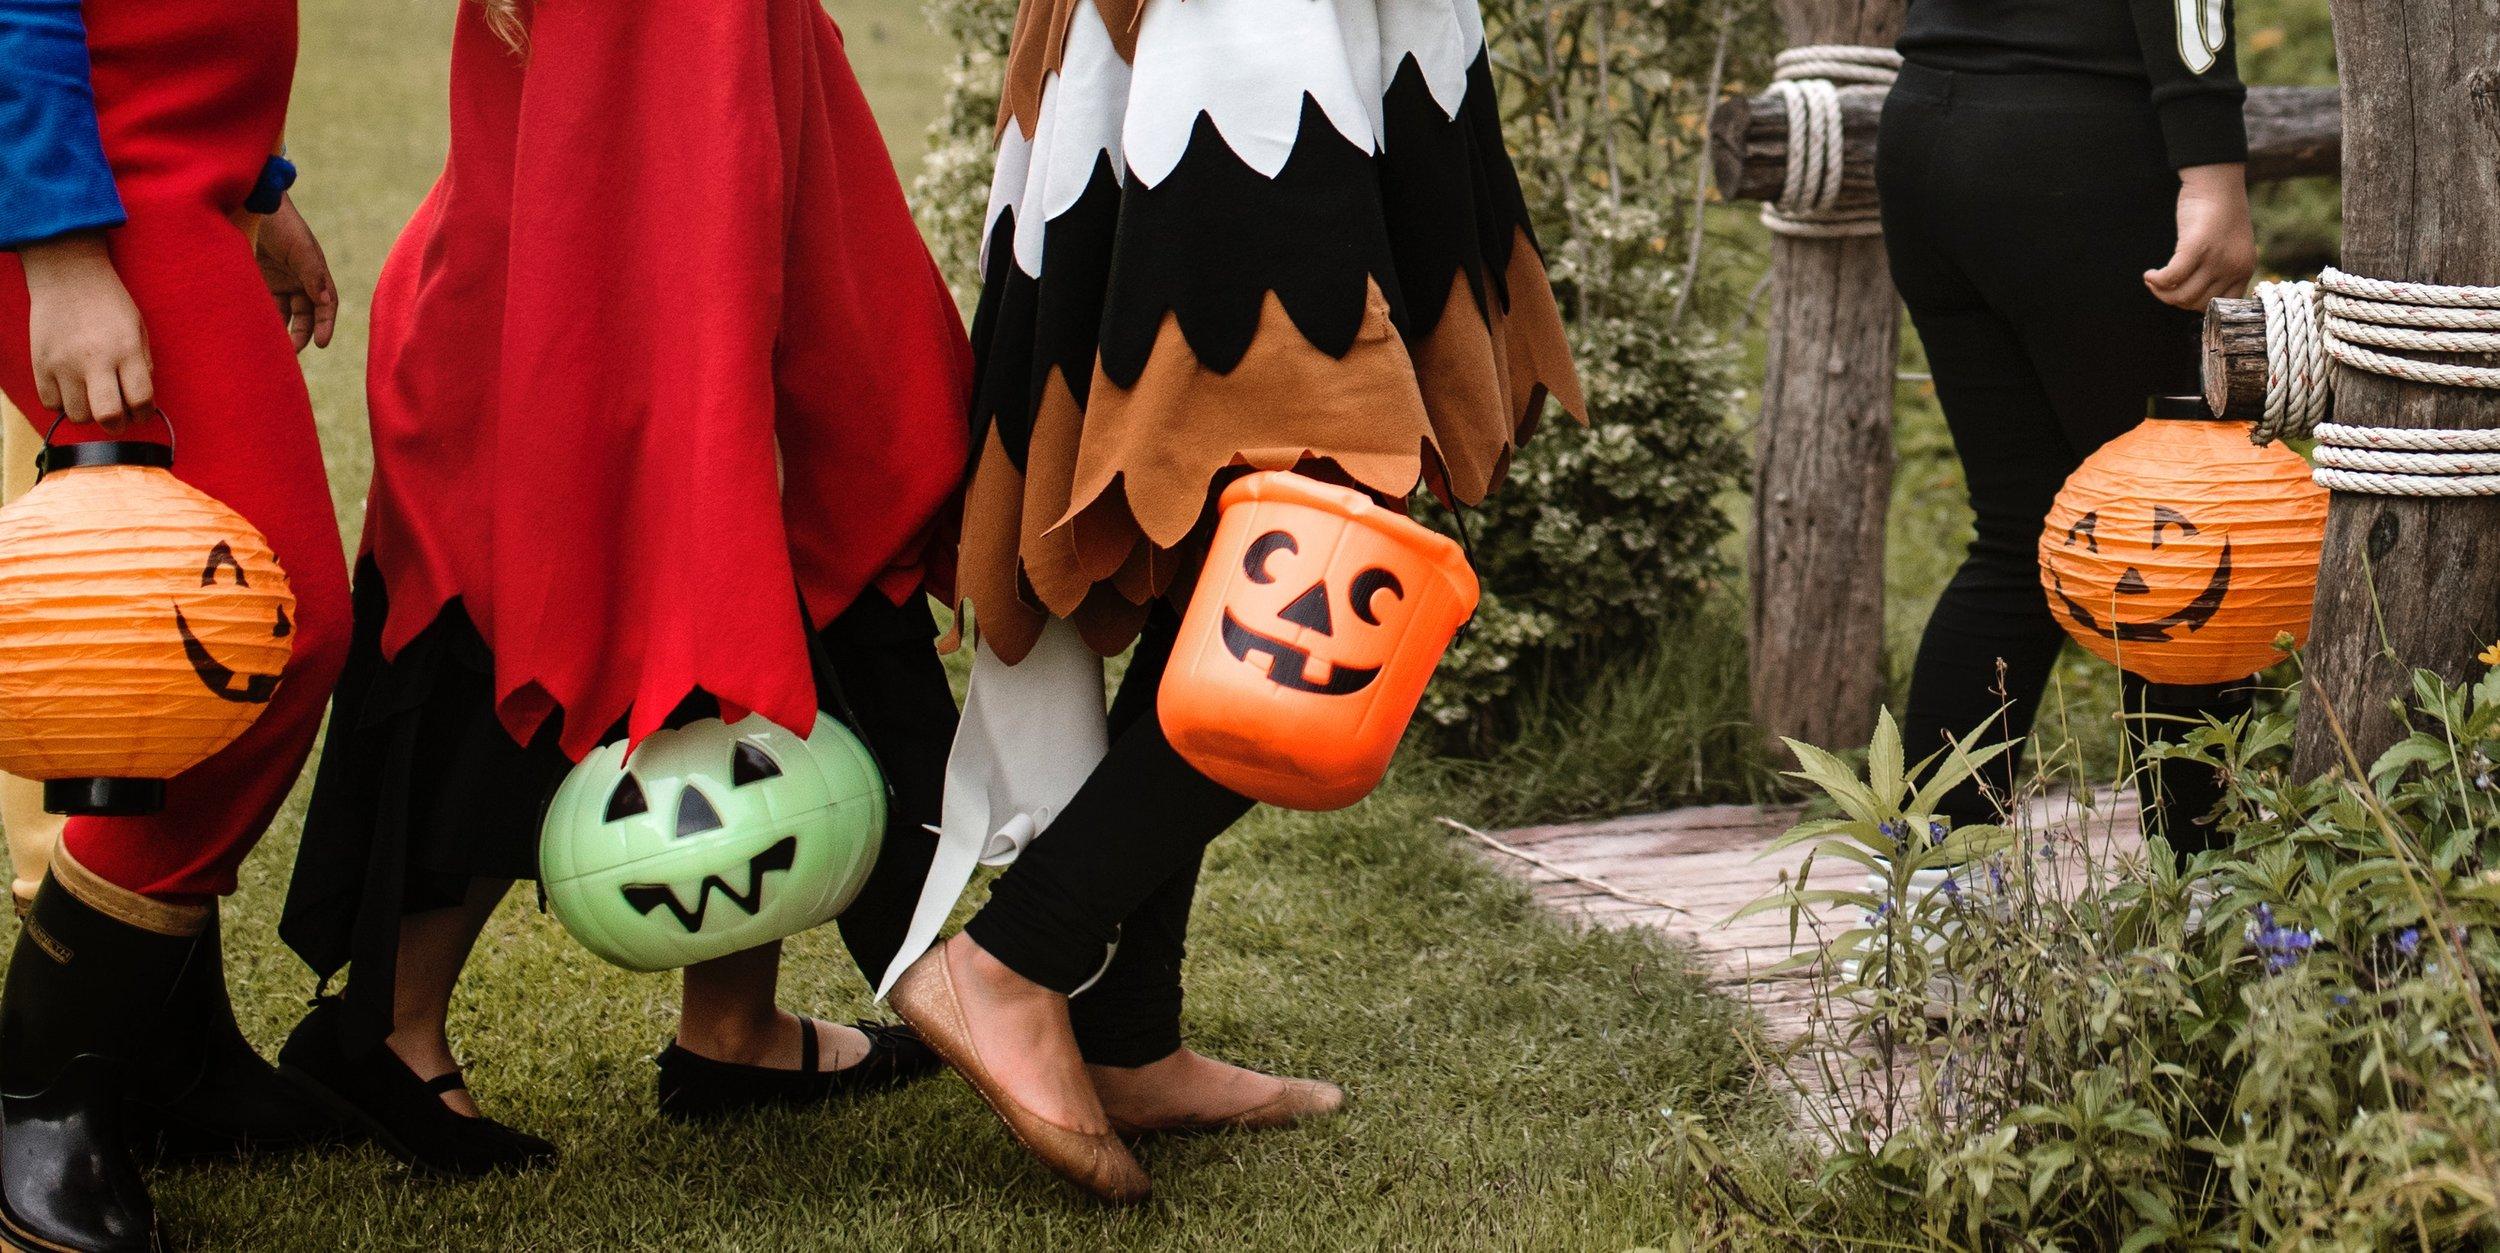 activity-bucket-costumes-1406352.jpg